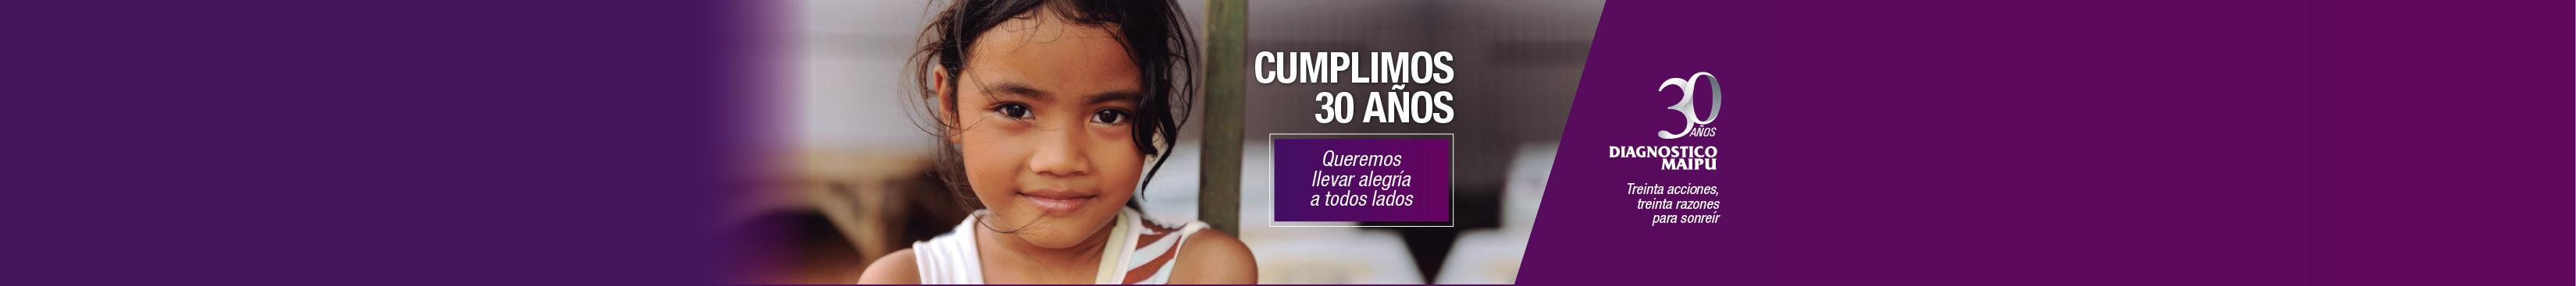 Banner-Web_Campaa-30-Aos_30-acciones-01